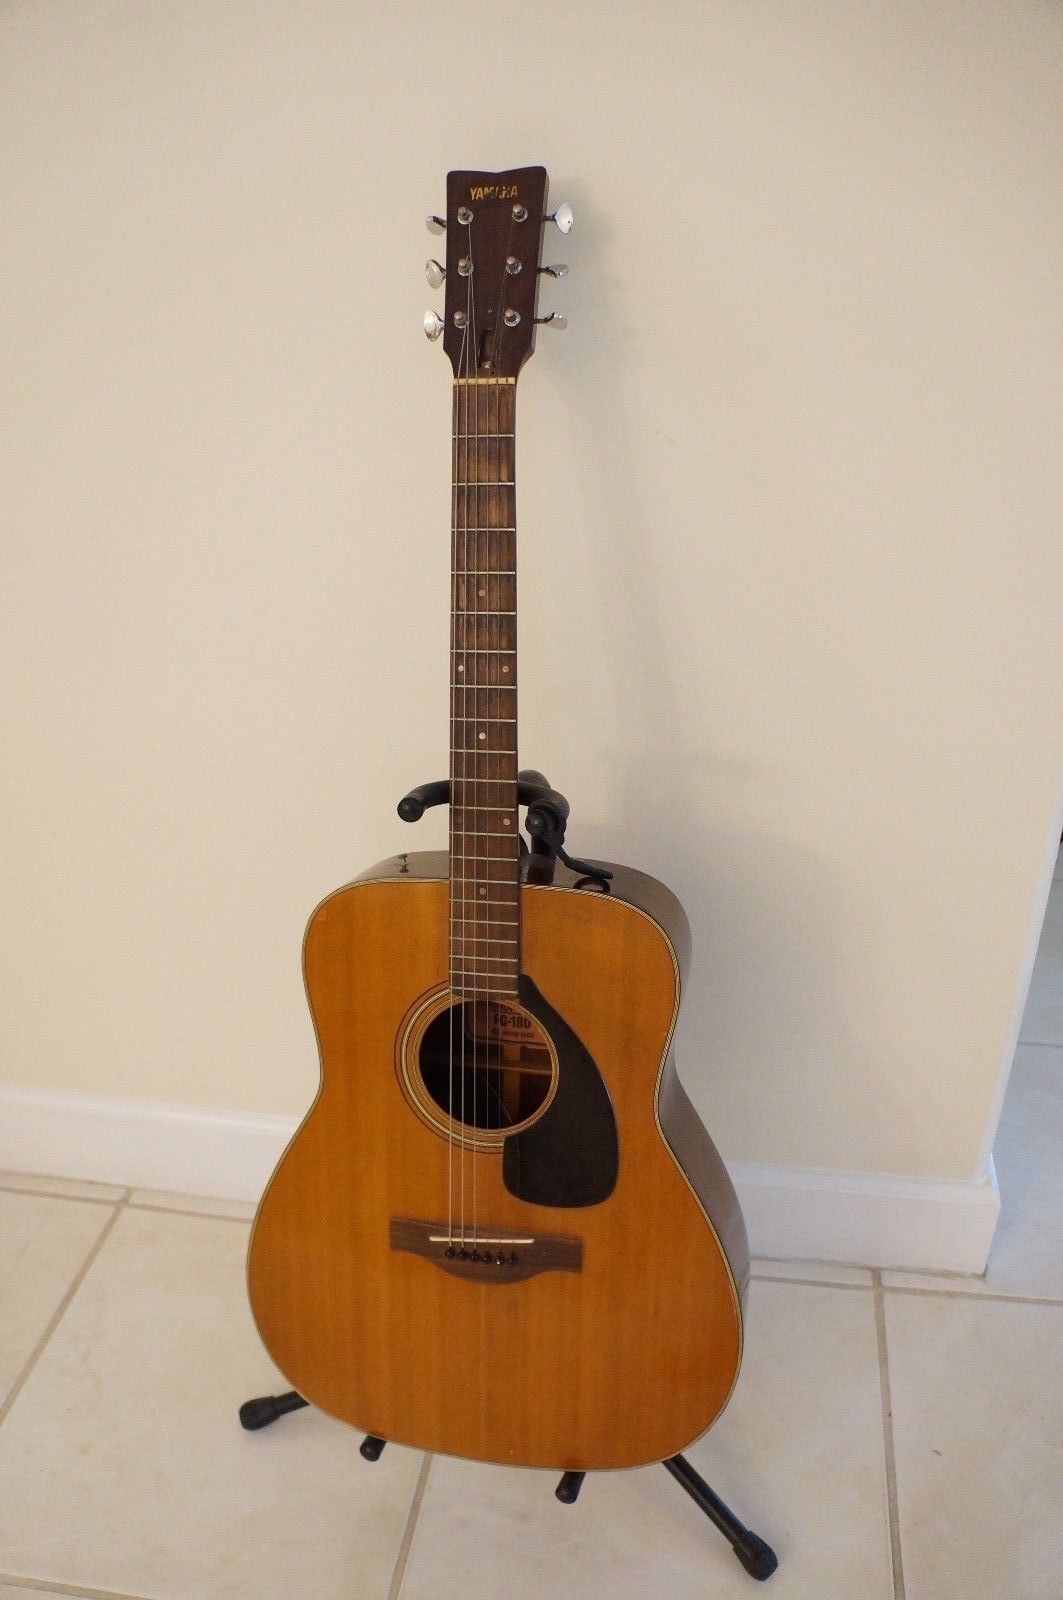 Guitar Vintage Yamaha Fg 180 Red Label Nippon Gakki Acoustic Guitar Made In Japan Please Retweet Acoustic Guitar Yamaha Fg Vintage Guitars